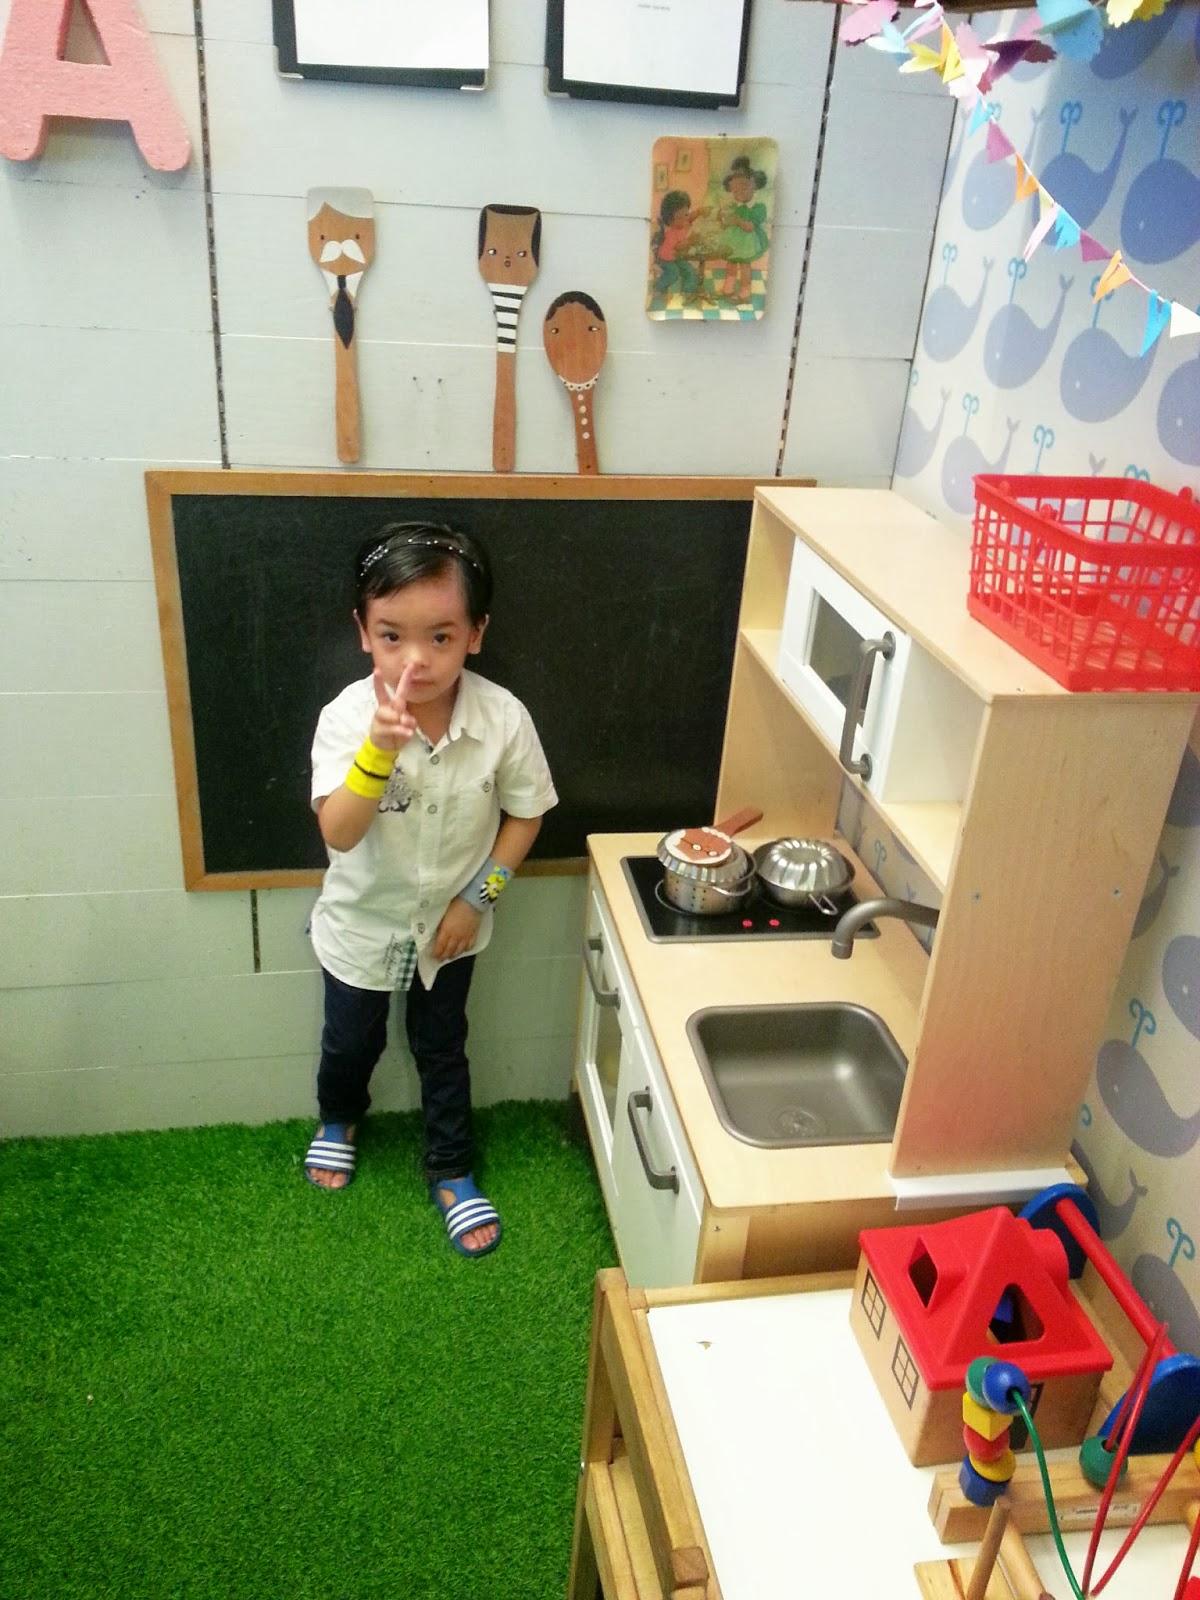 Siap Ade Dapur Mainan Yg Mcm Real Je